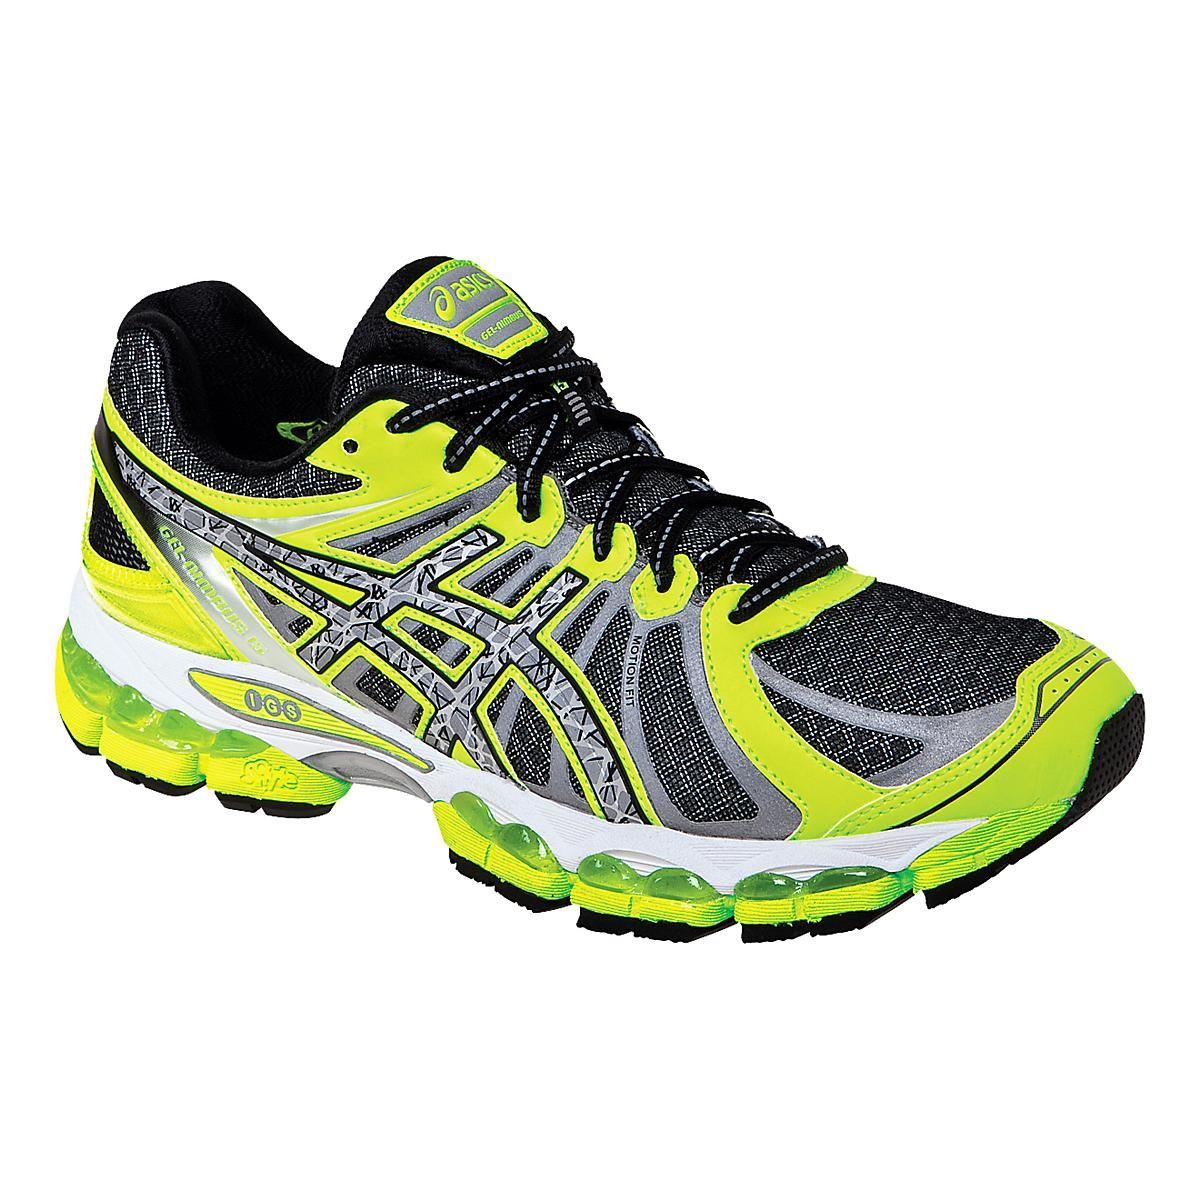 GELNimbus 15 LiteShow Running shoes for men, Running